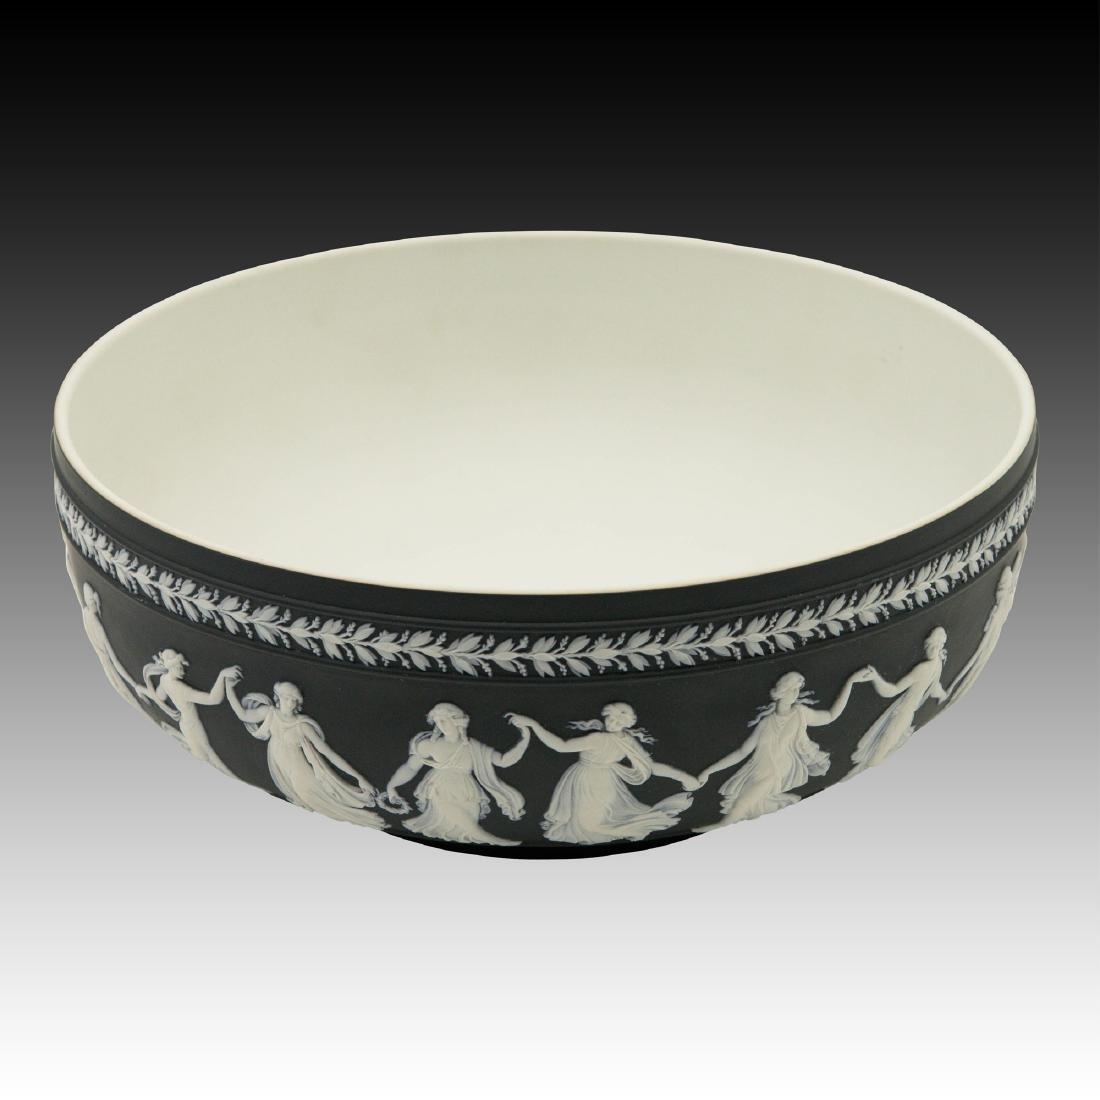 Large Wedgwood Black Jasperware Bowl